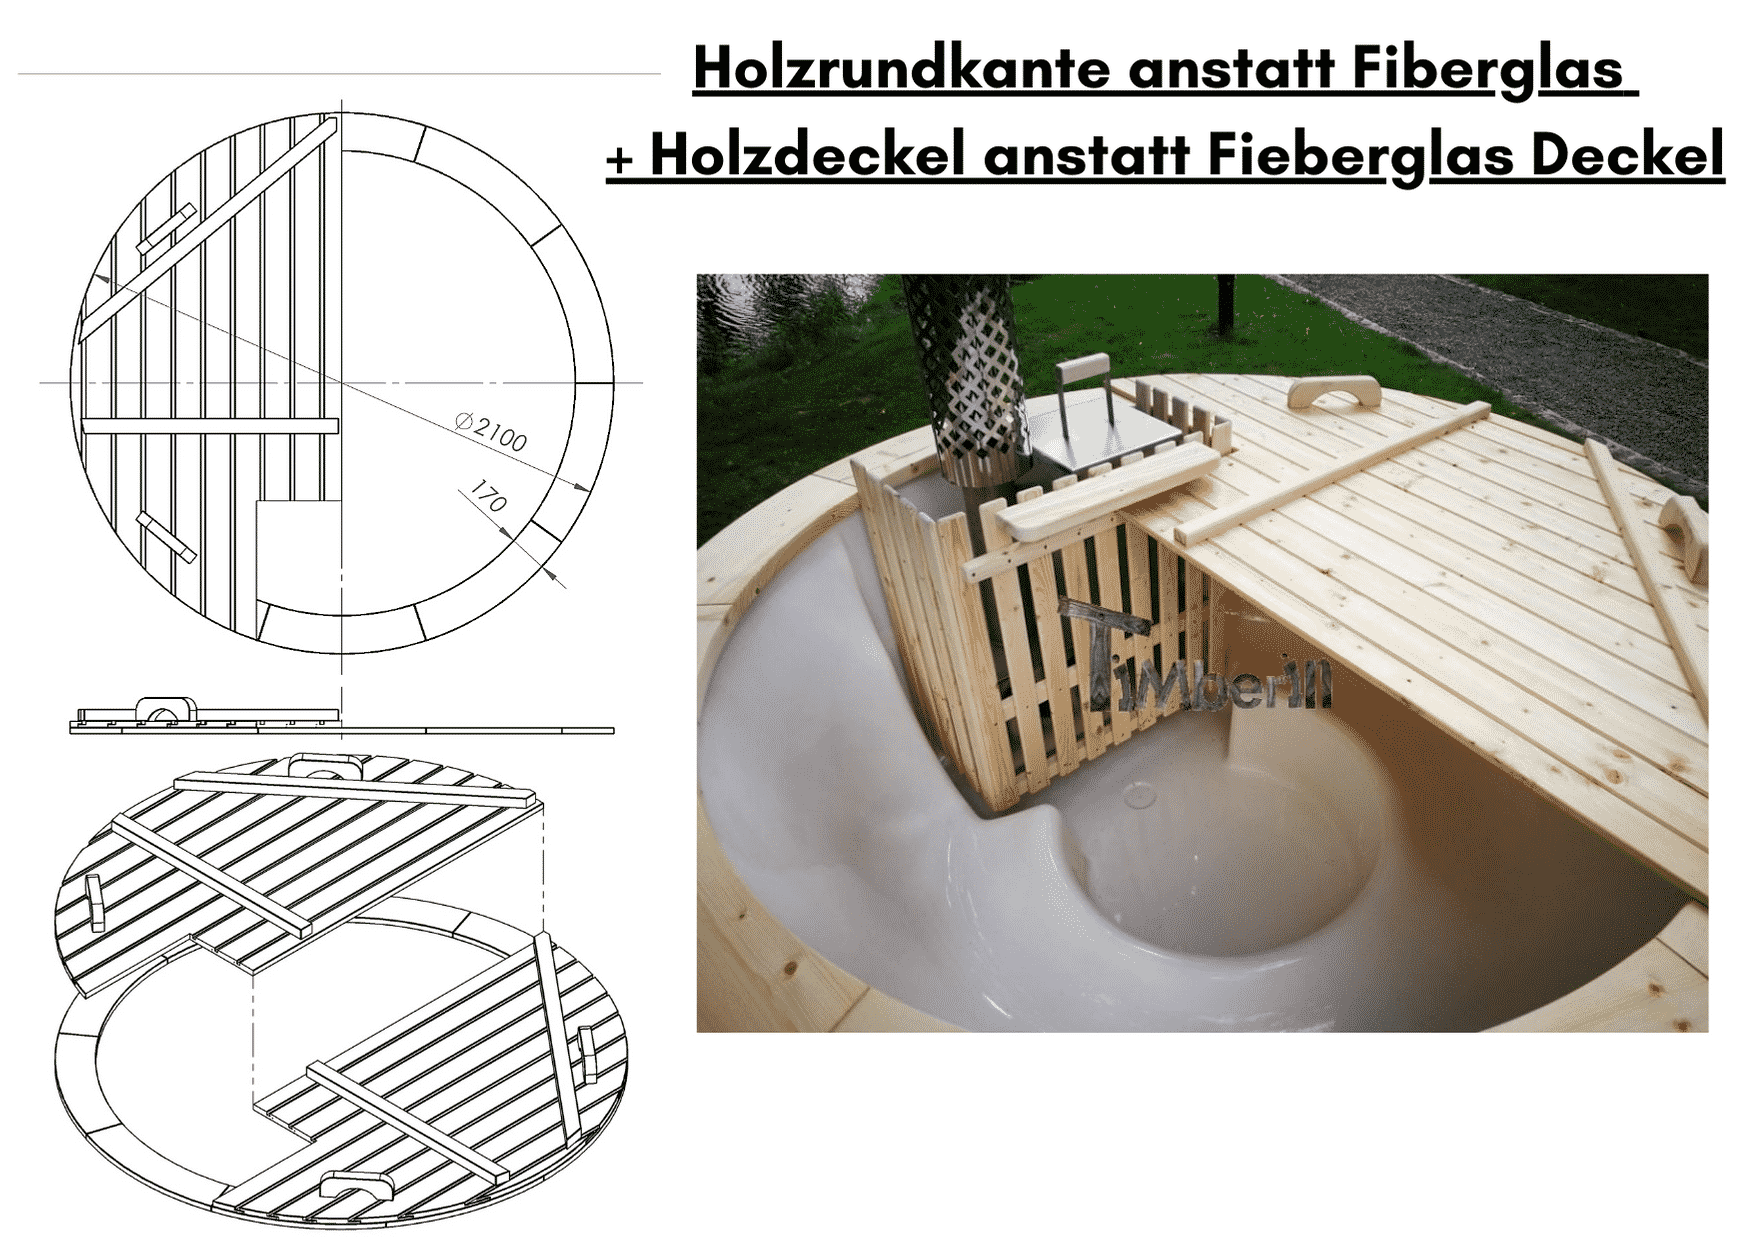 Holzrundkante anstatt Fiberglas wellness basic